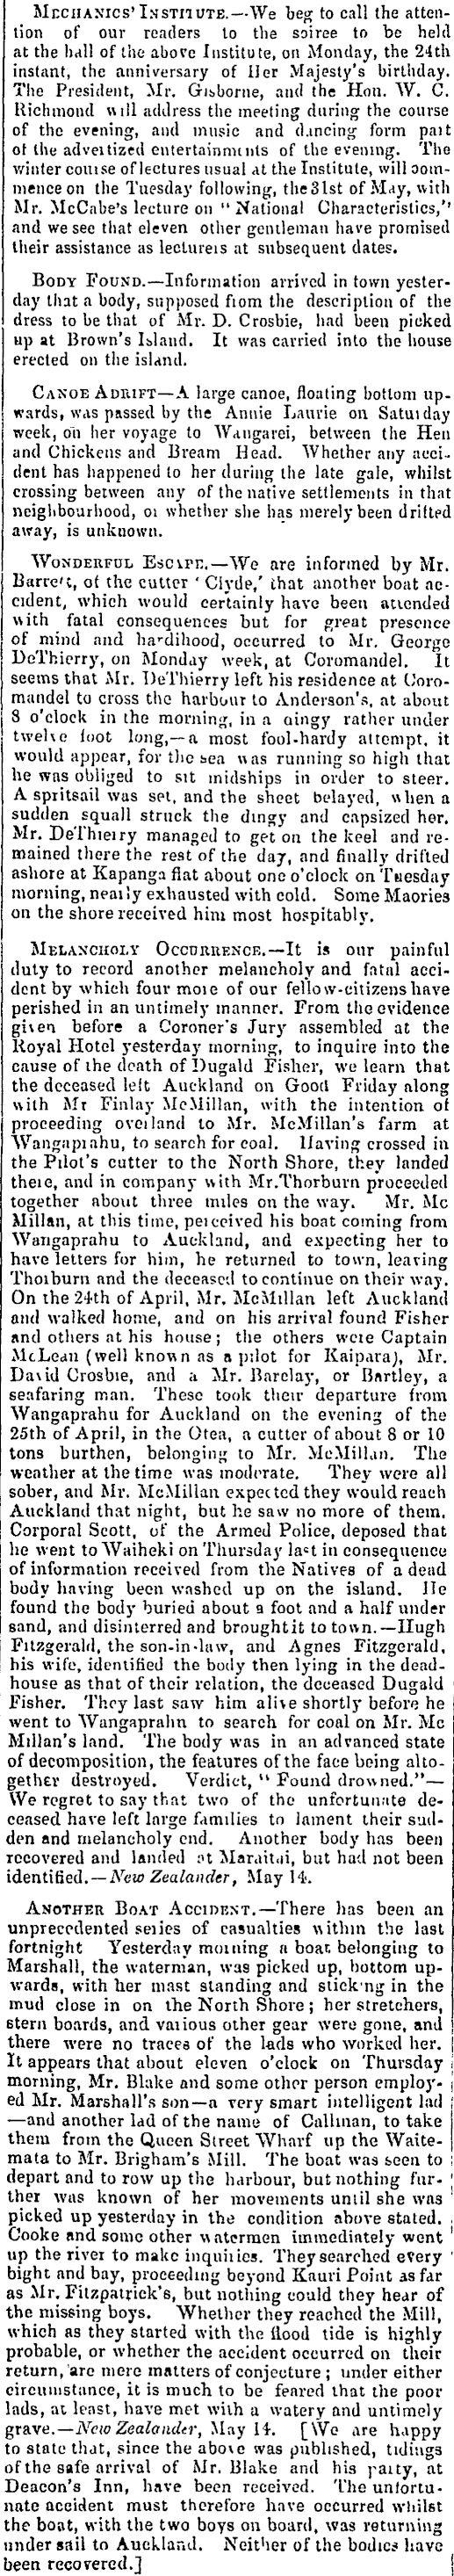 1859 Finlay McMillan Auckland Whangaprahu melancholy event